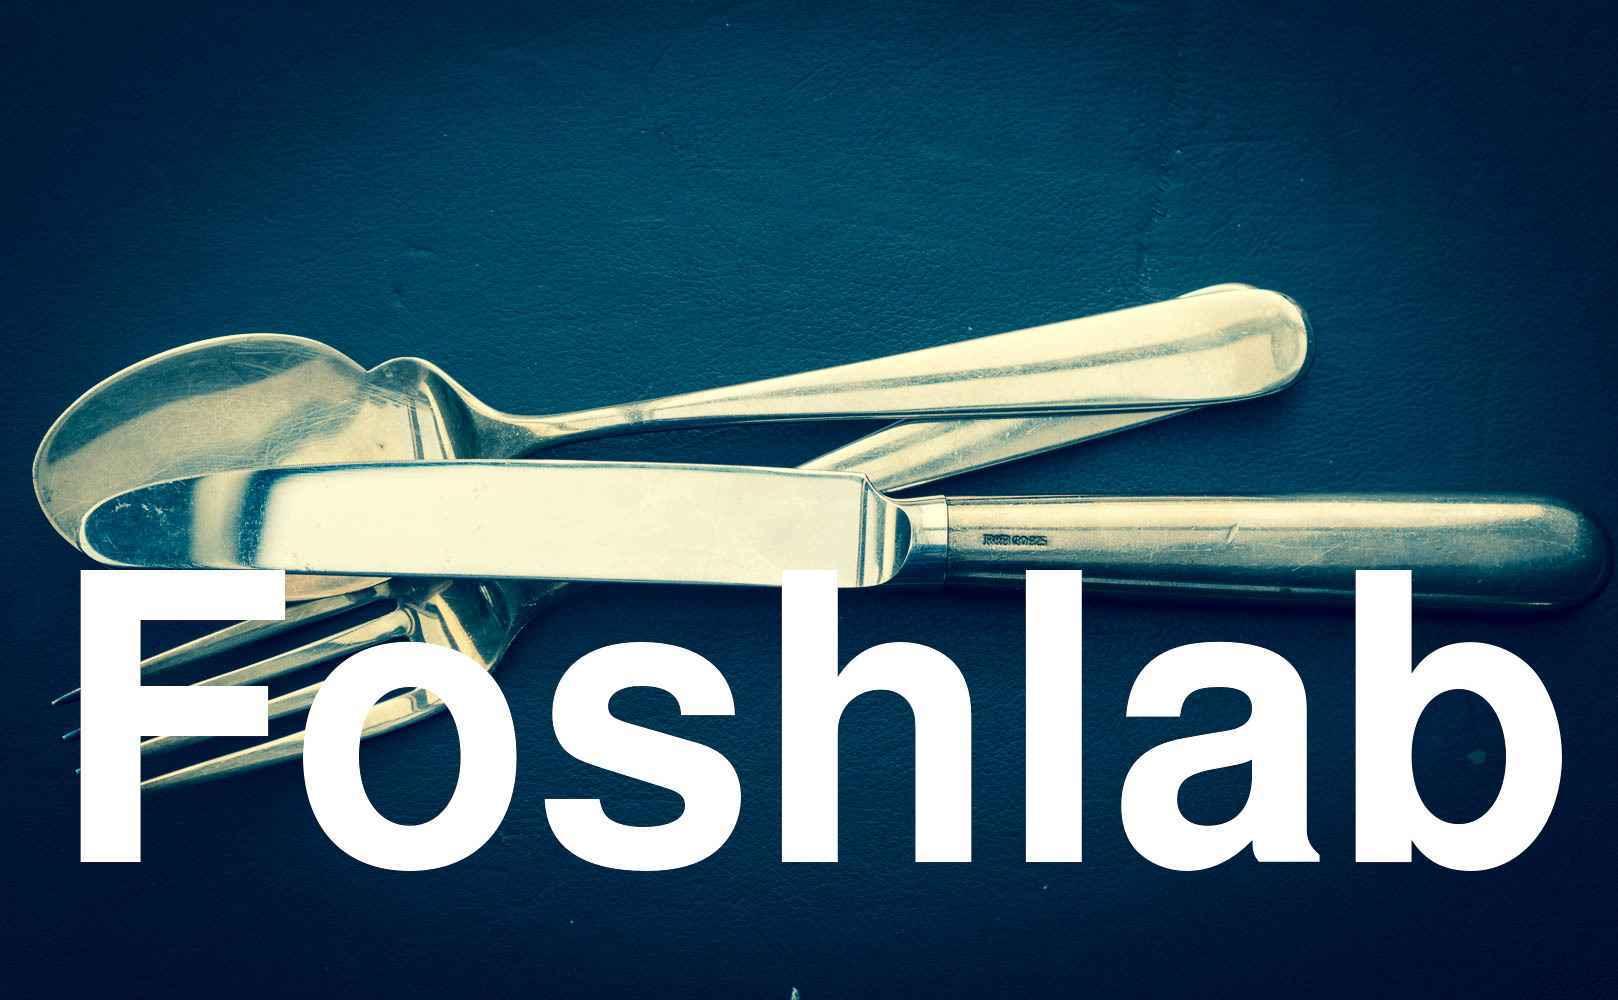 Restaurantkritik: Foshlab in Palma de Mallorca, Spanien,